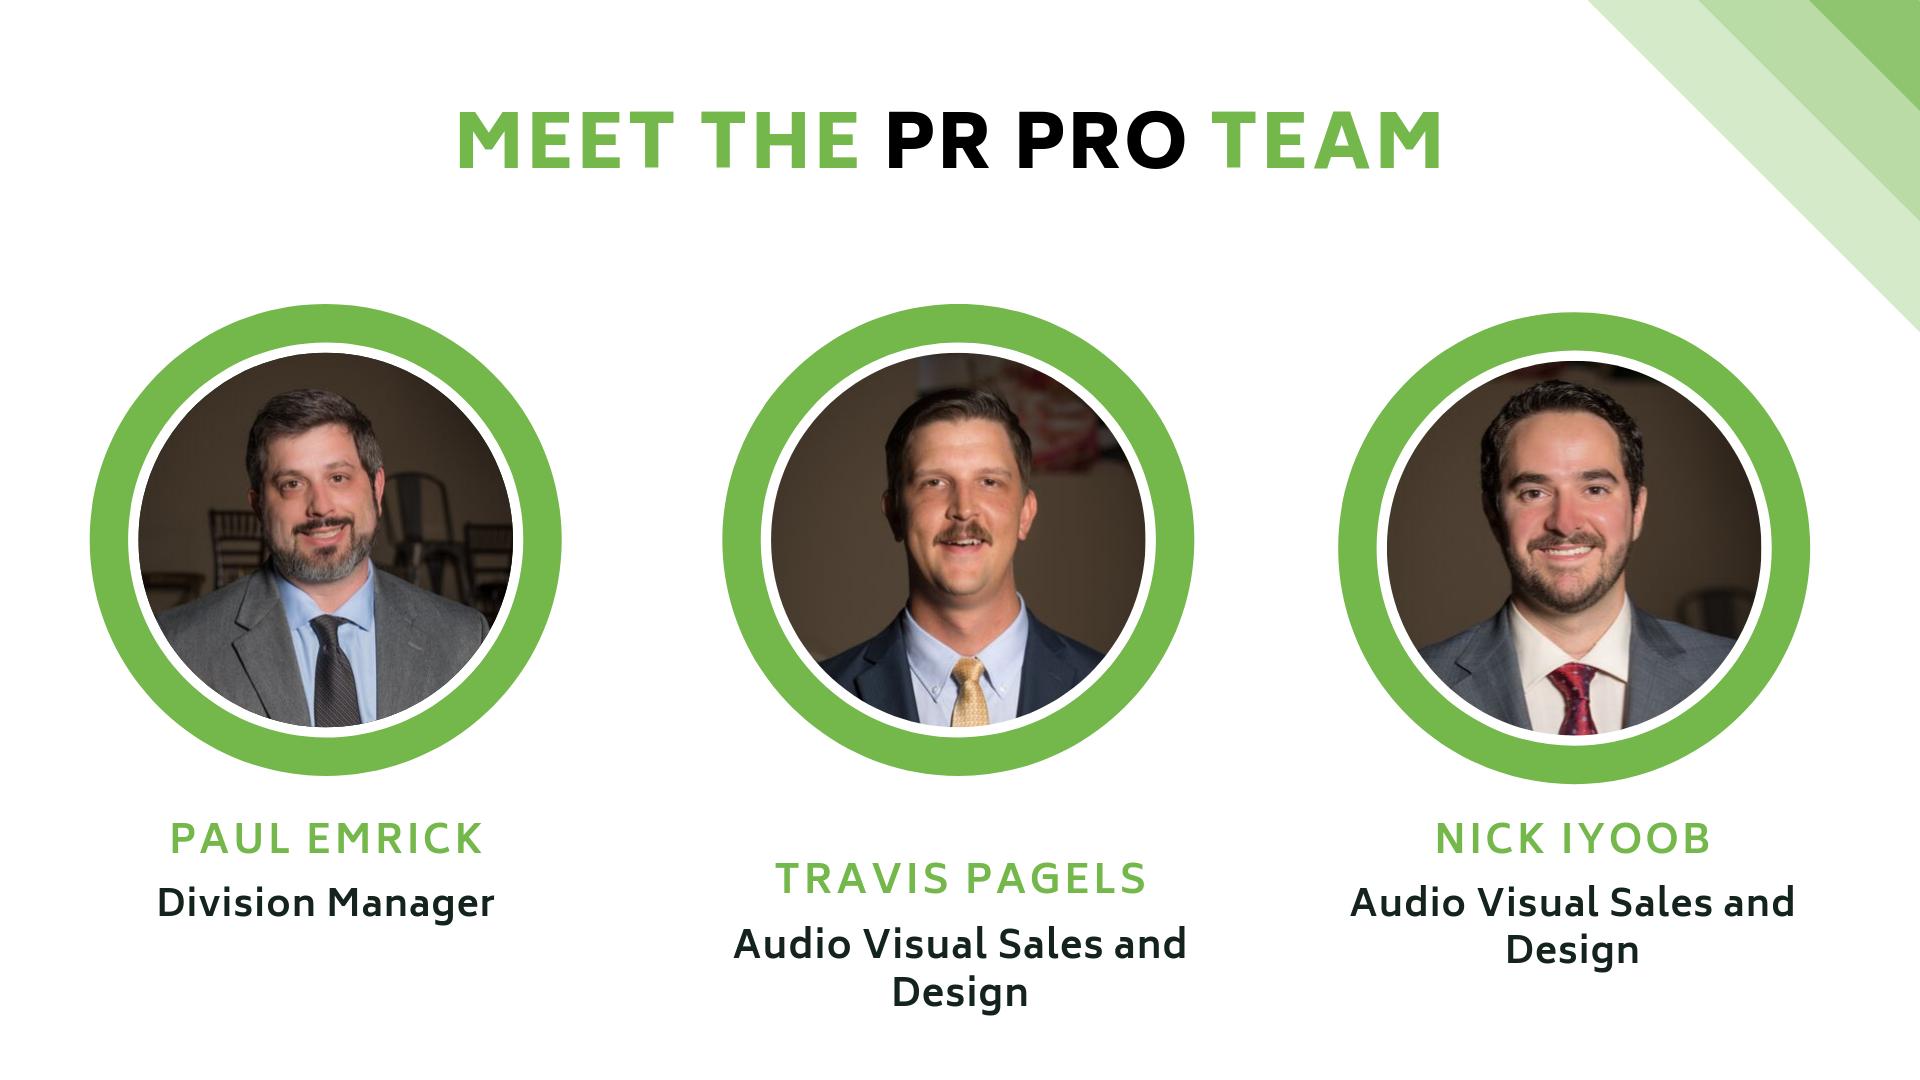 Meet the Team - PR PRO